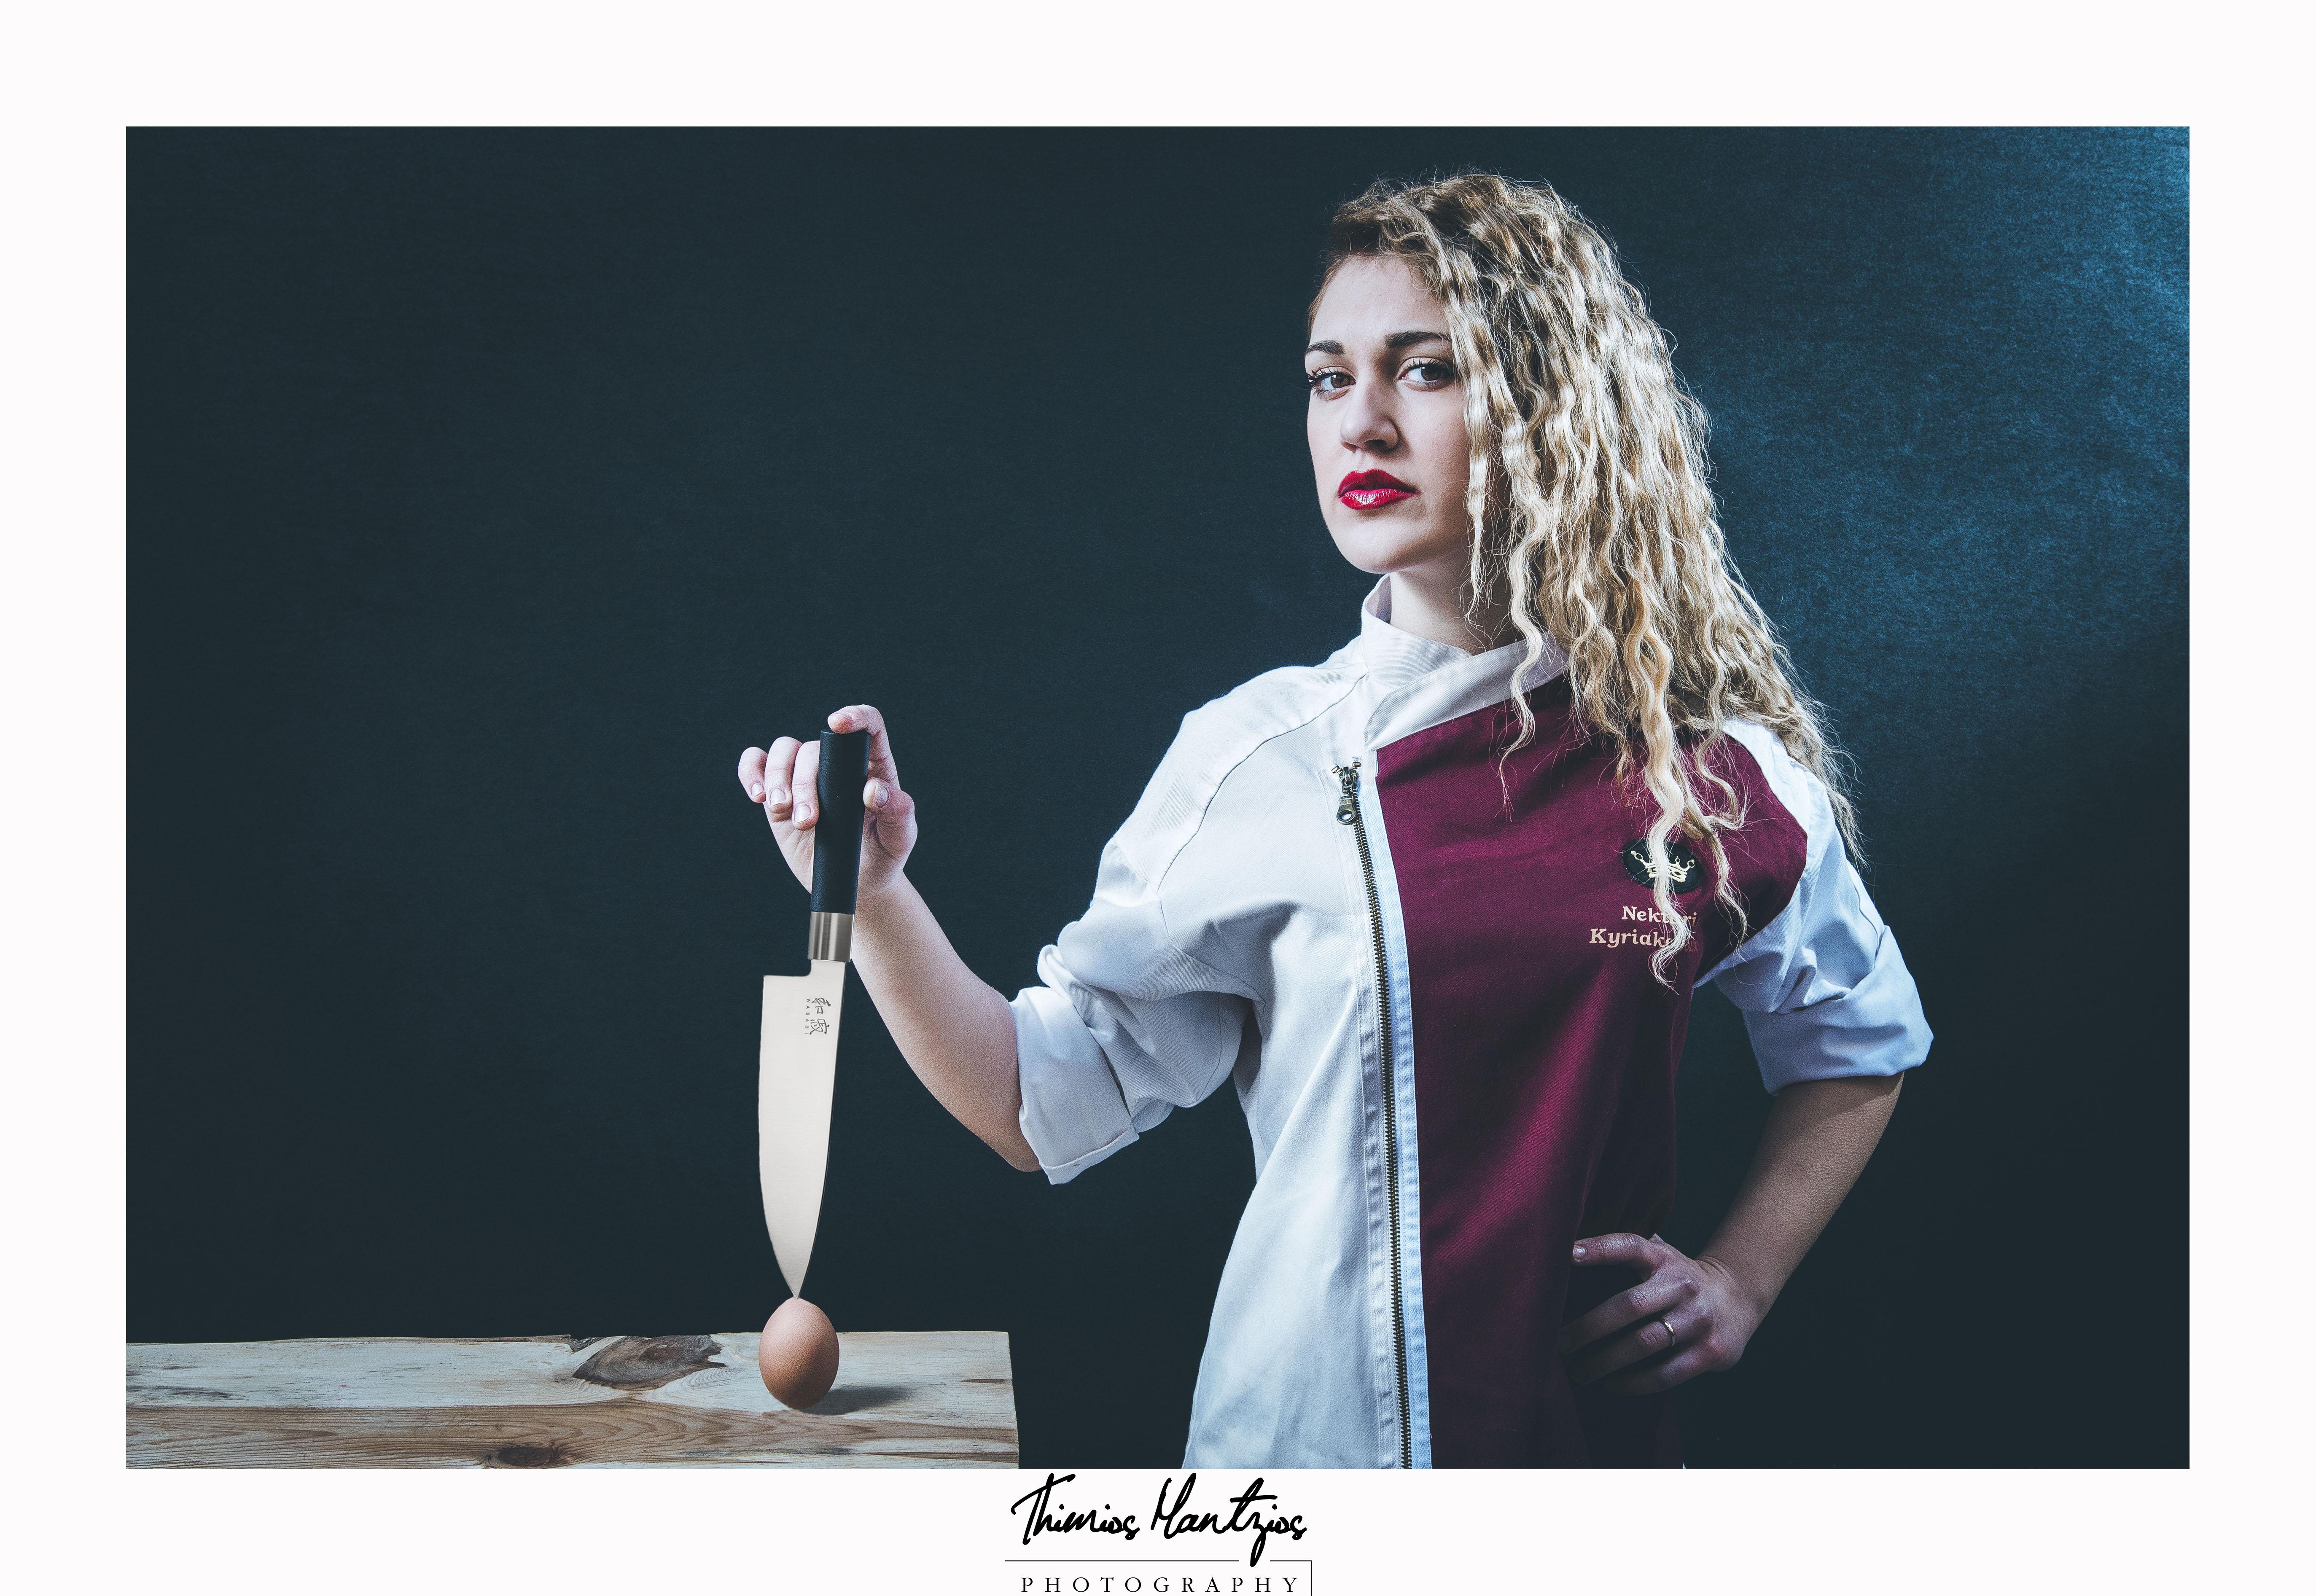 Pastry cook Nektaria Kyriakopoulou